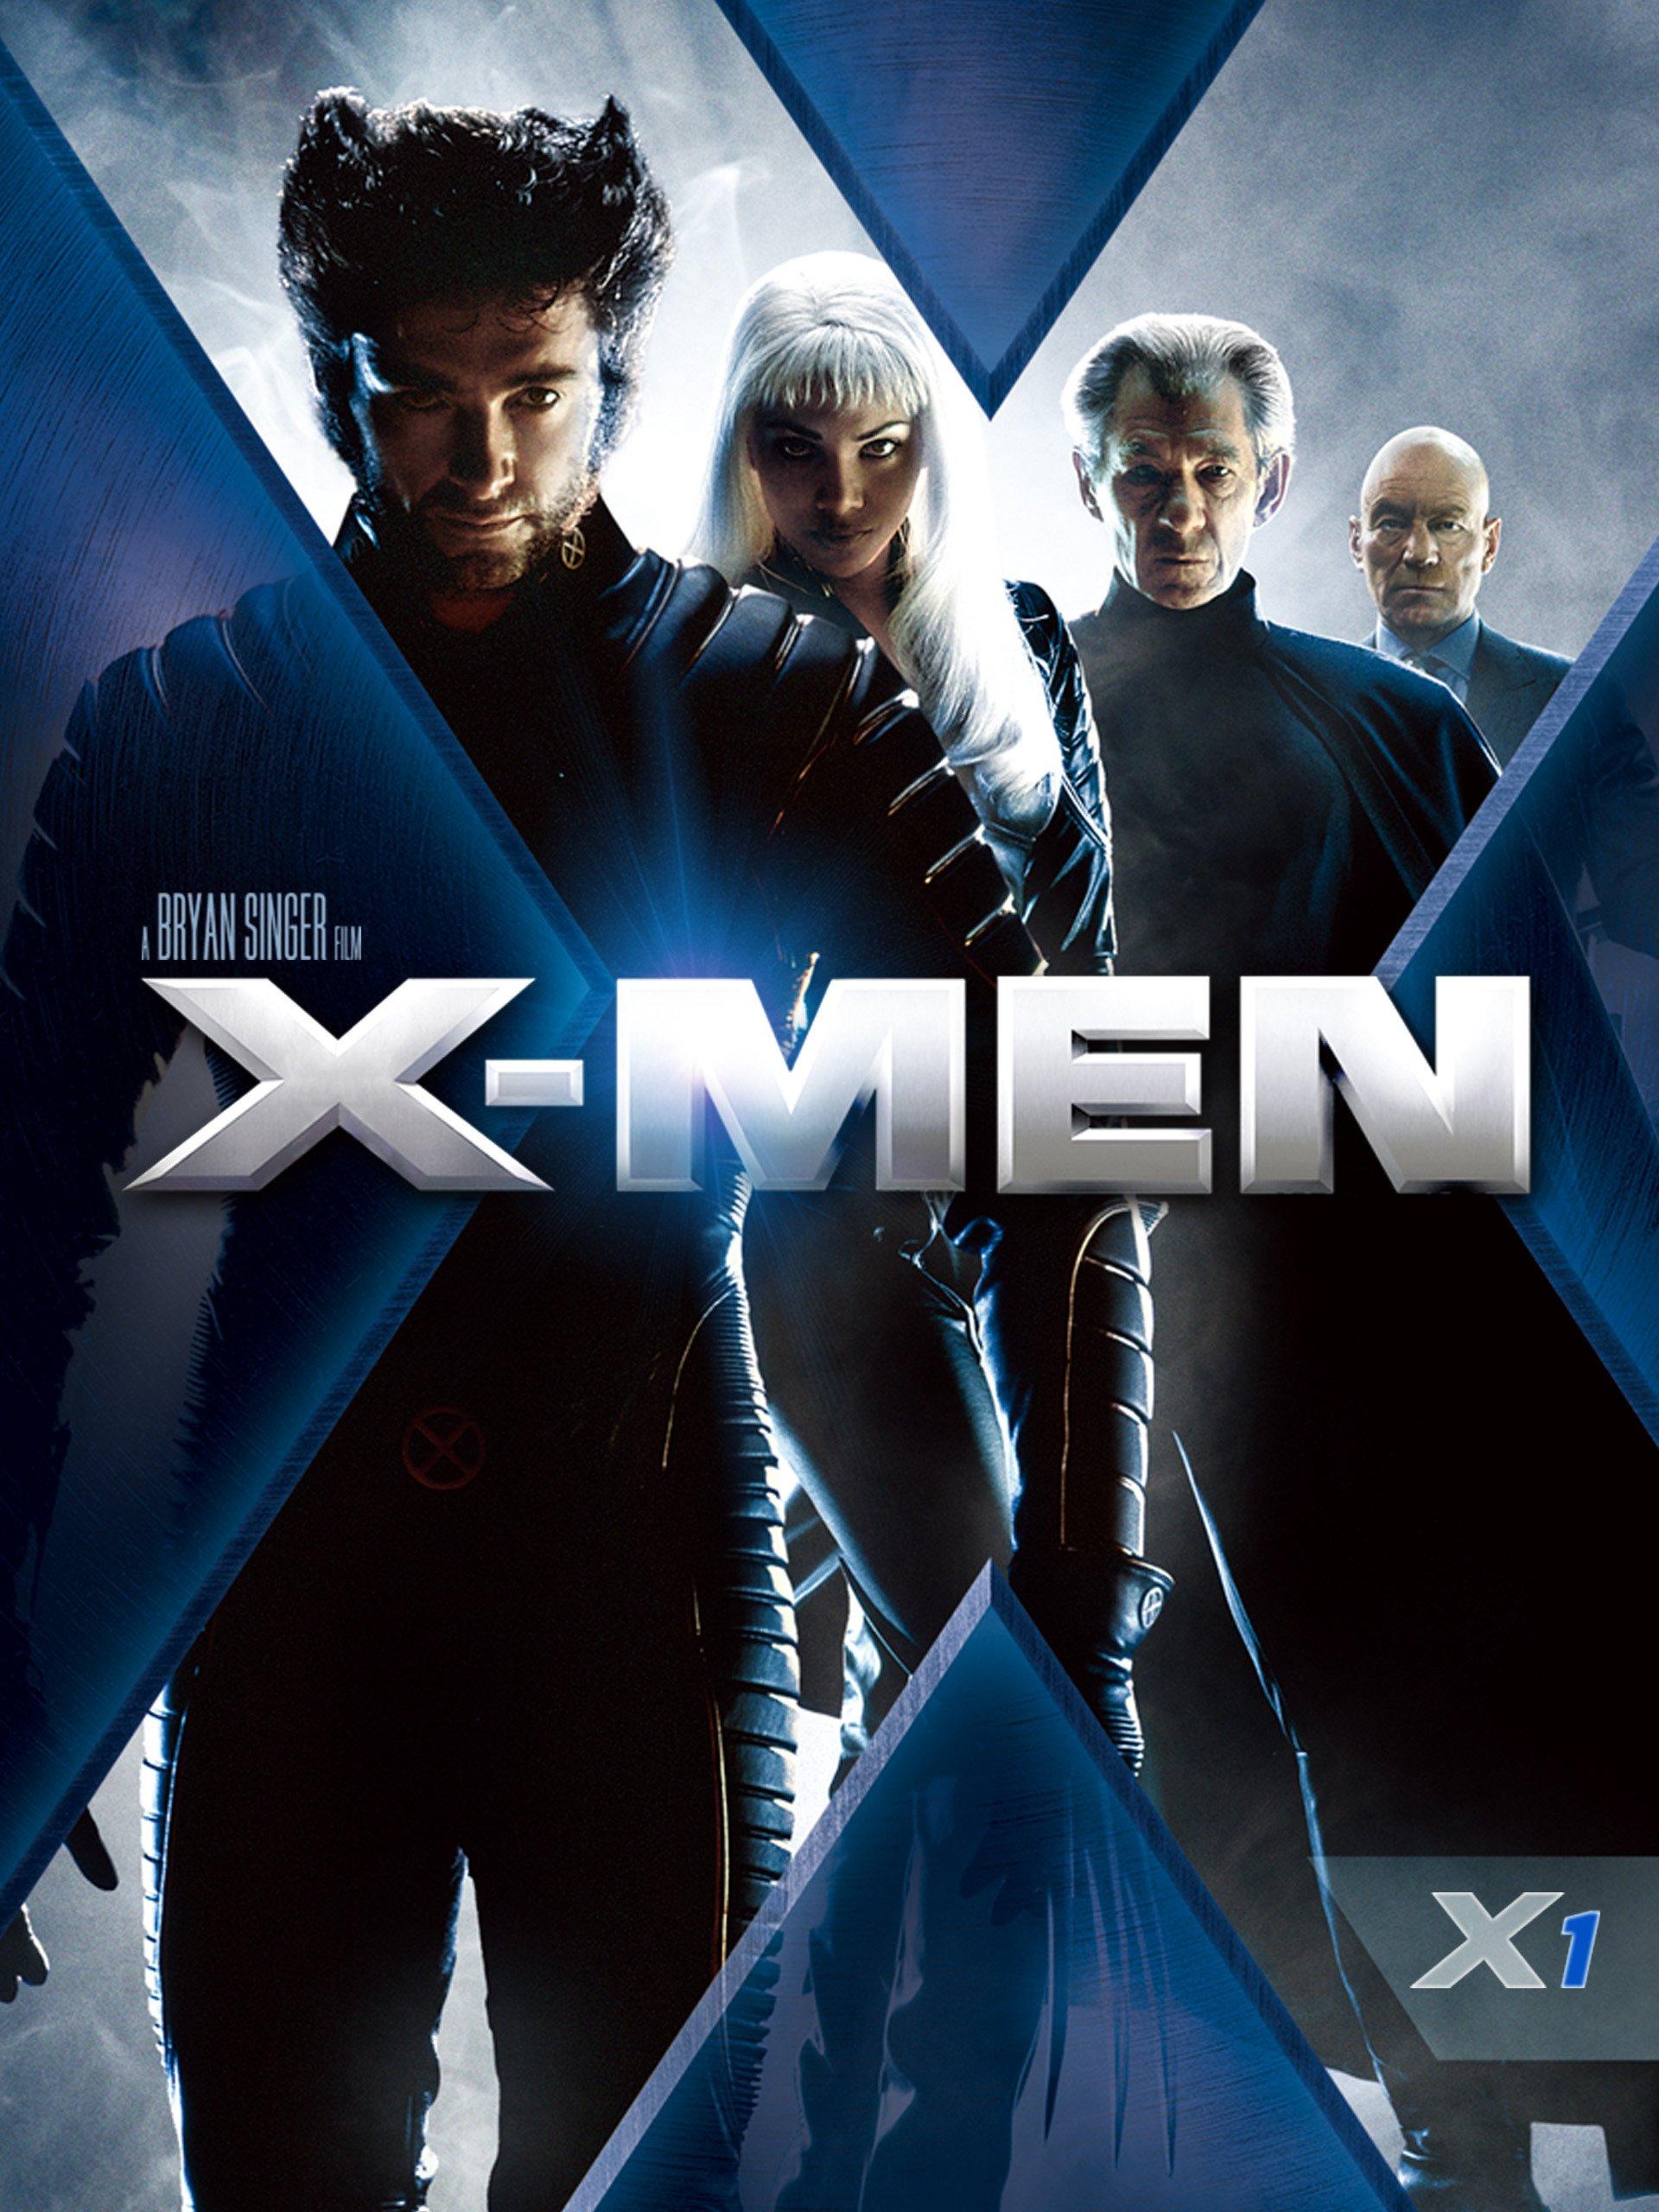 Amazon.co.jp: X-MEN (吹替版)を観る | Prime Video